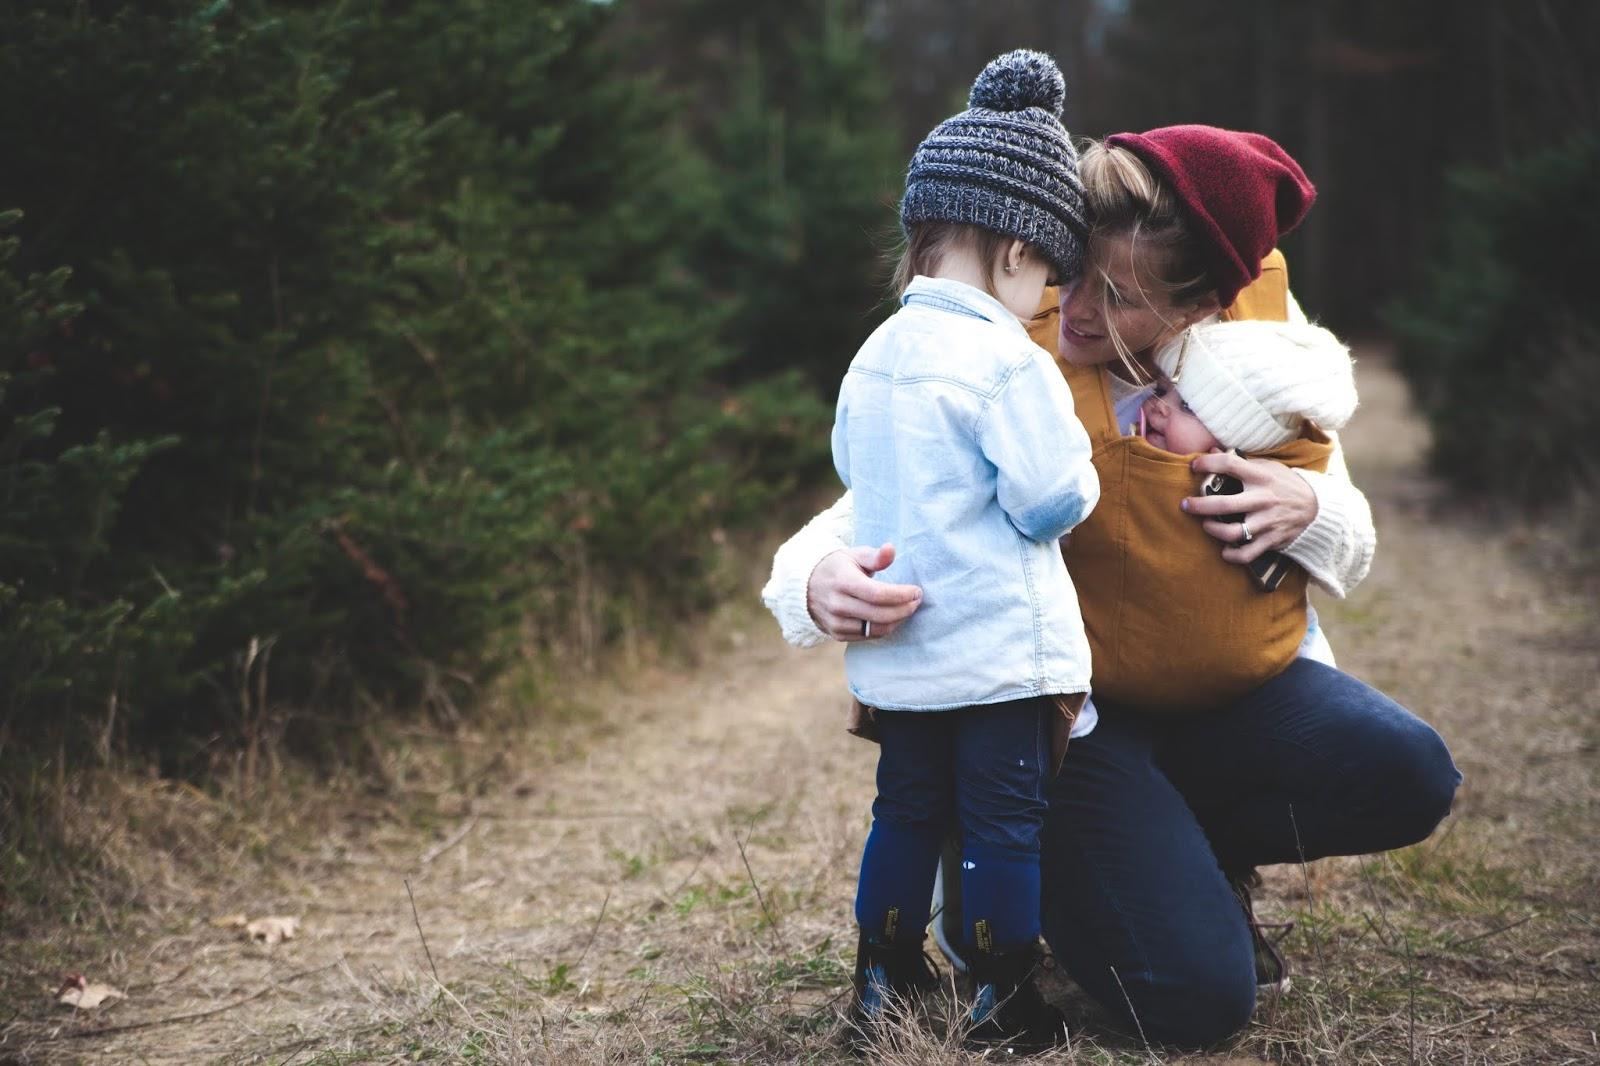 Kumpulan Kata Mutiara Penuh Cinta Untuk Mother's Day